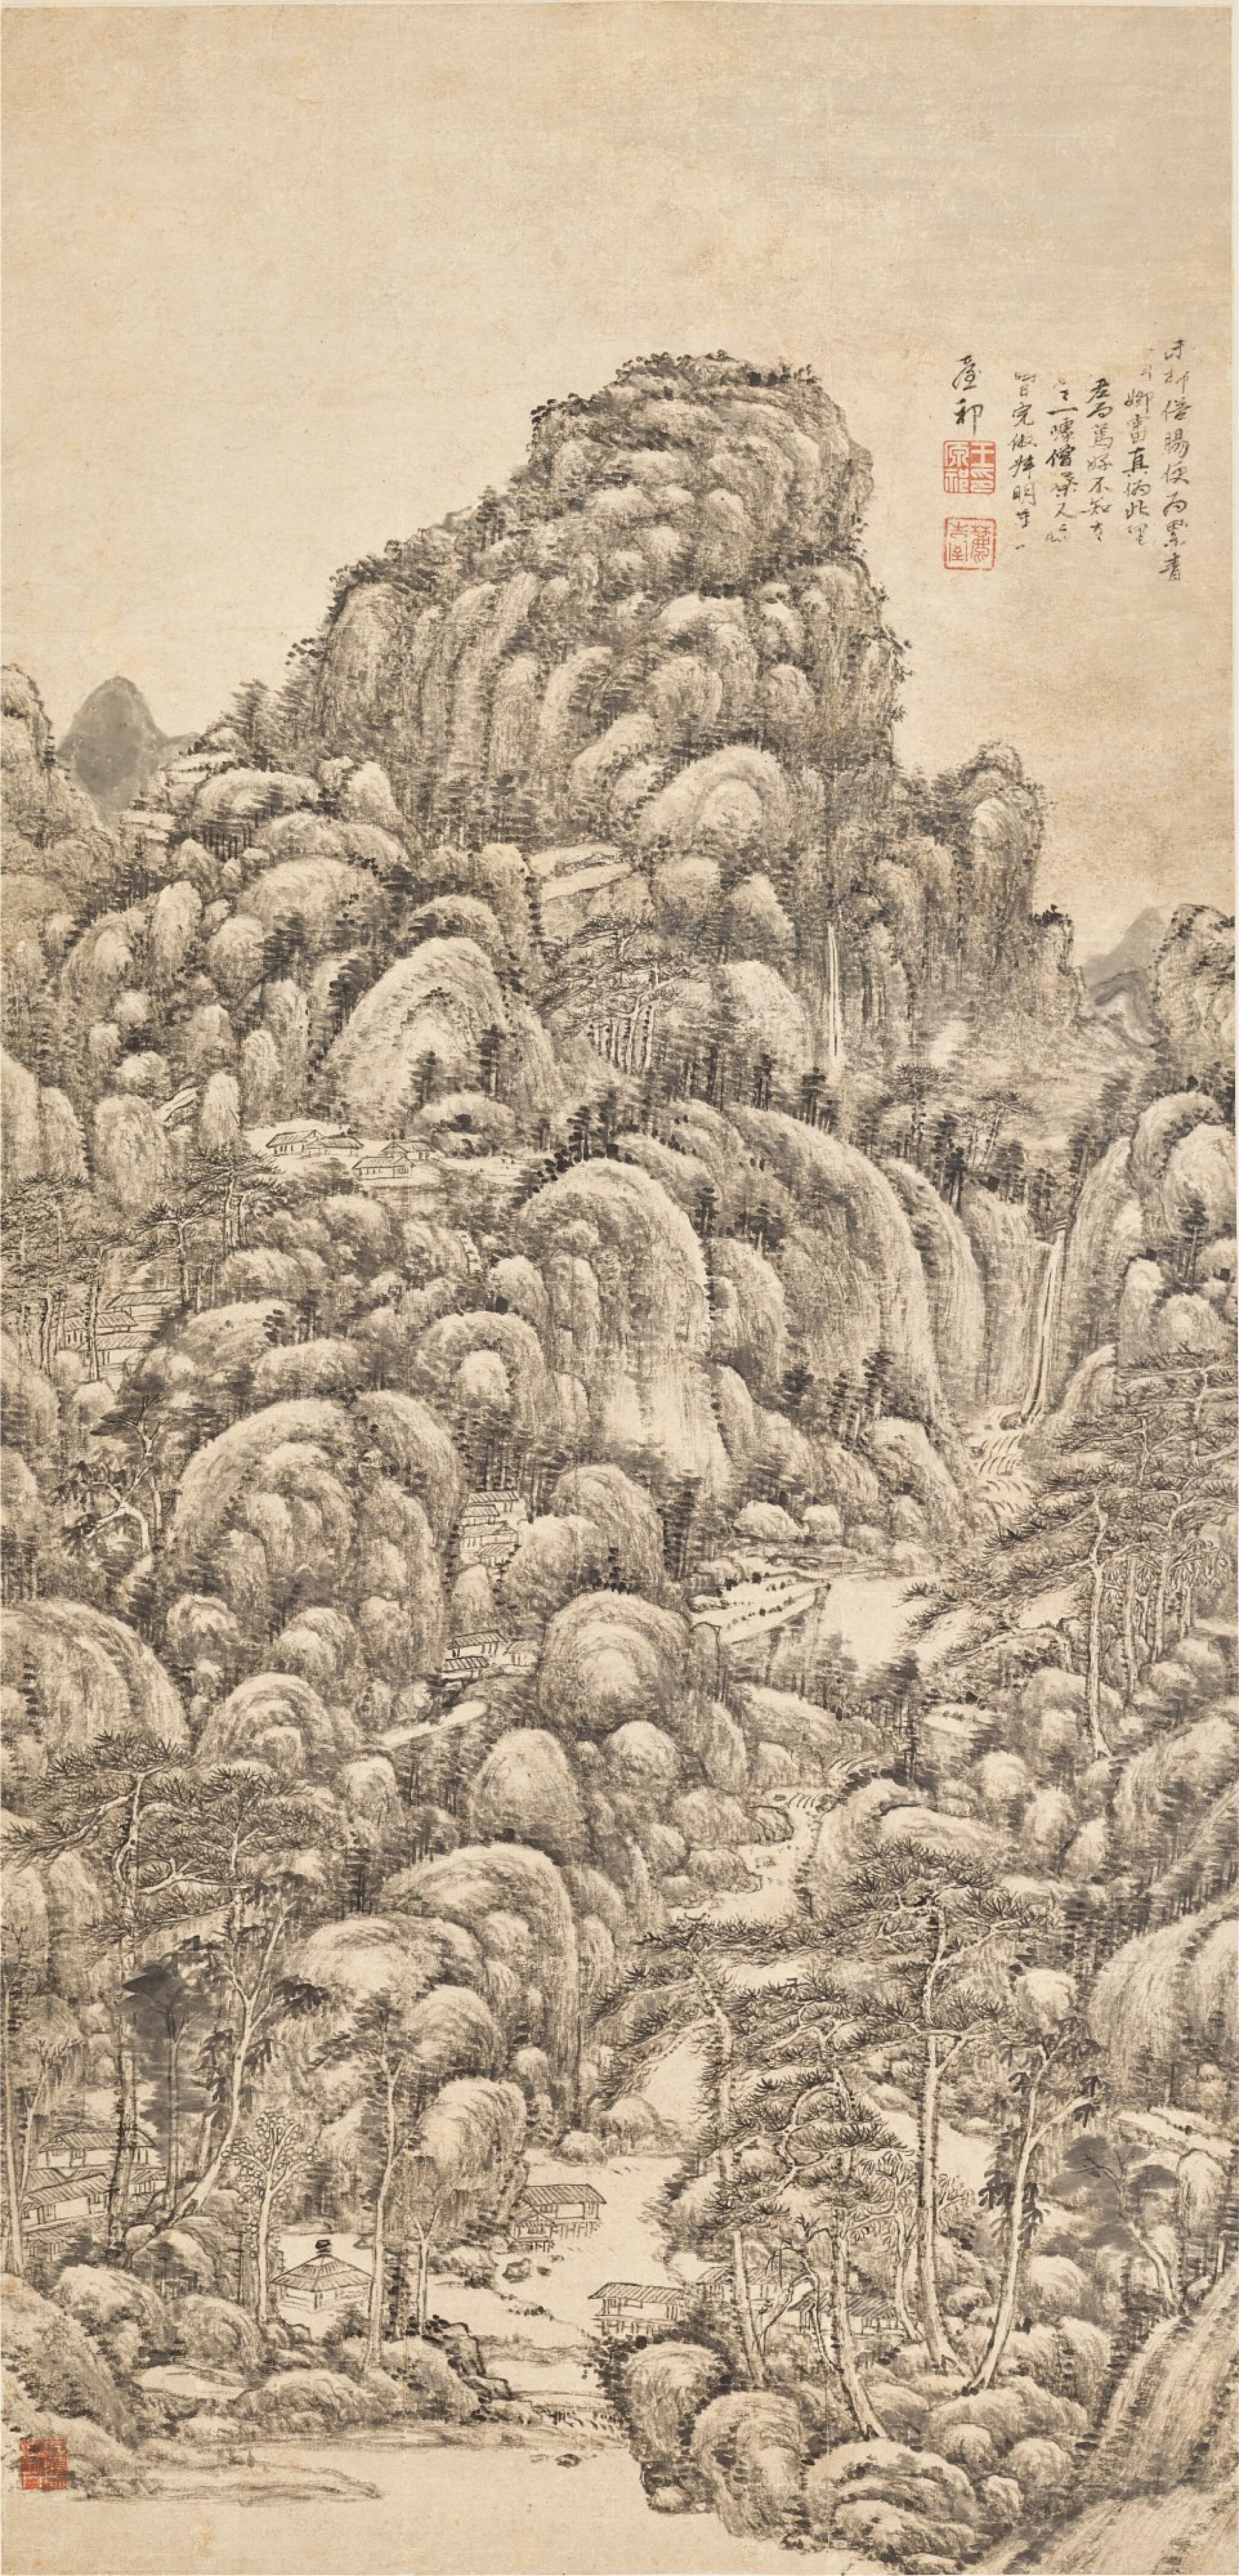 View full screen - View 1 of Lot 3078. Wang Yuanqi 1642 - 1715 王原祁 1642-1715   Landscape after Wang Meng 仿王蒙山水     .